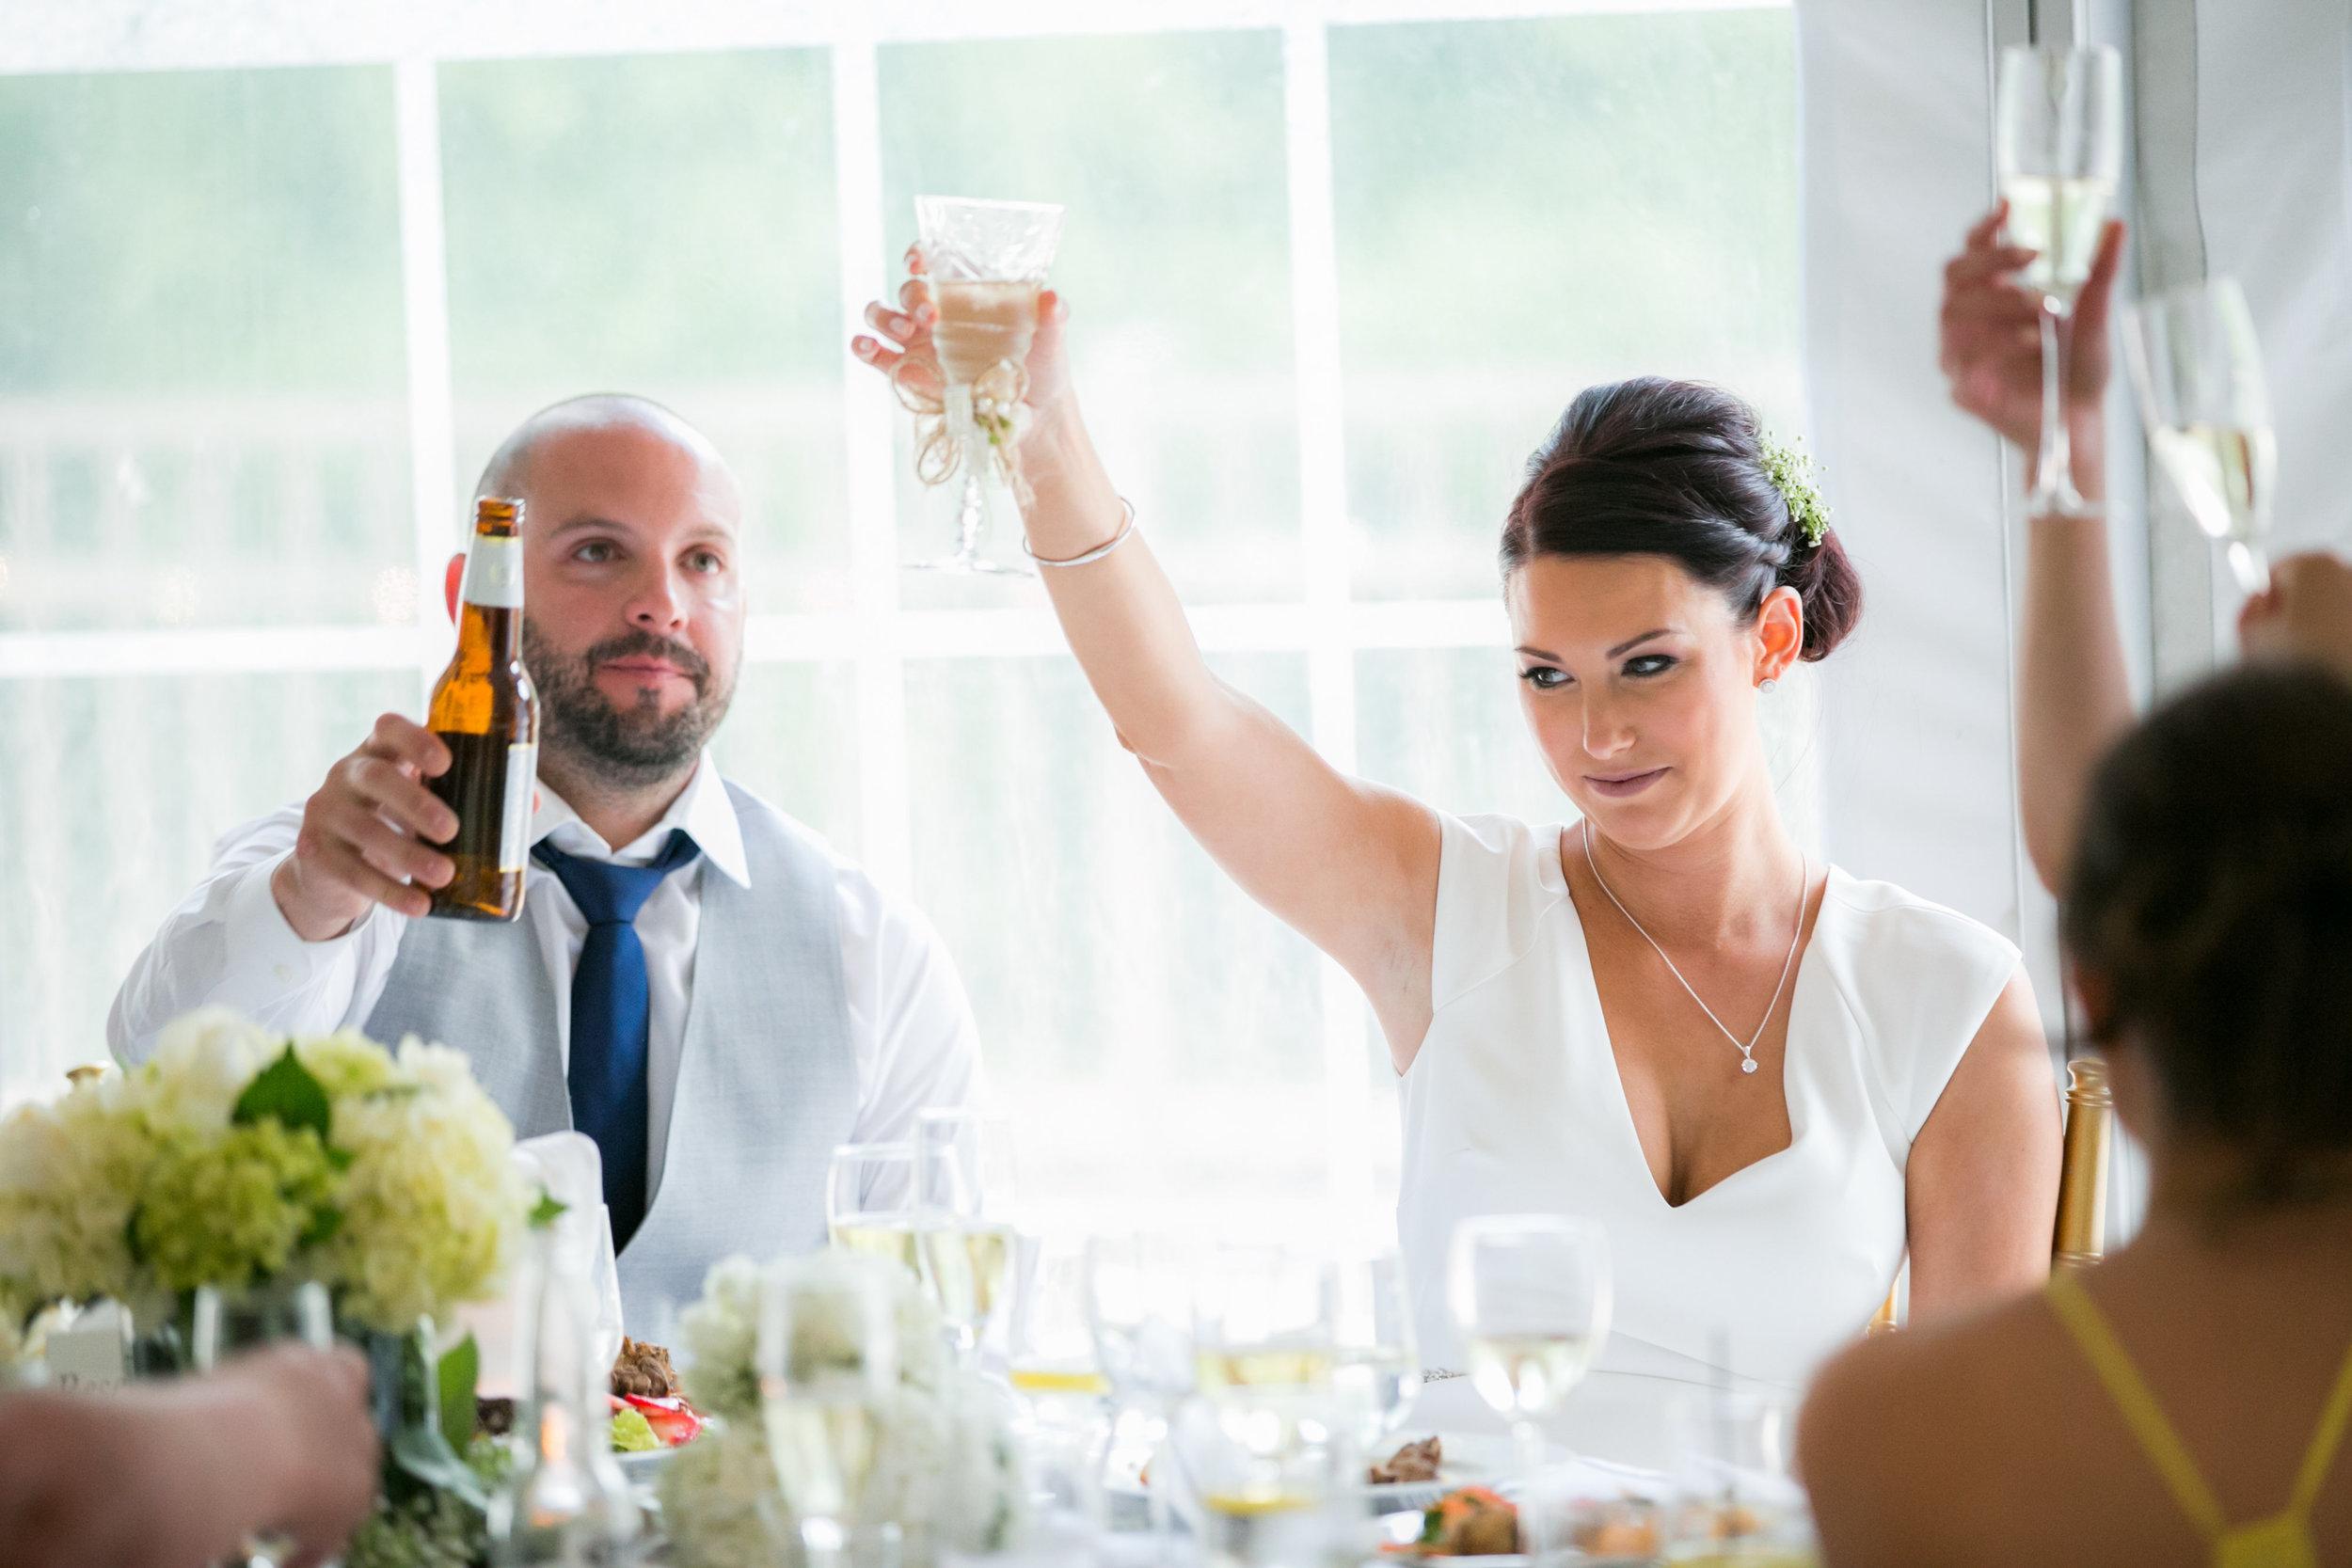 Pure elegance events Tynise Kee dc wedding planner va wedding planner rust manor house leesburg -0063.jpg